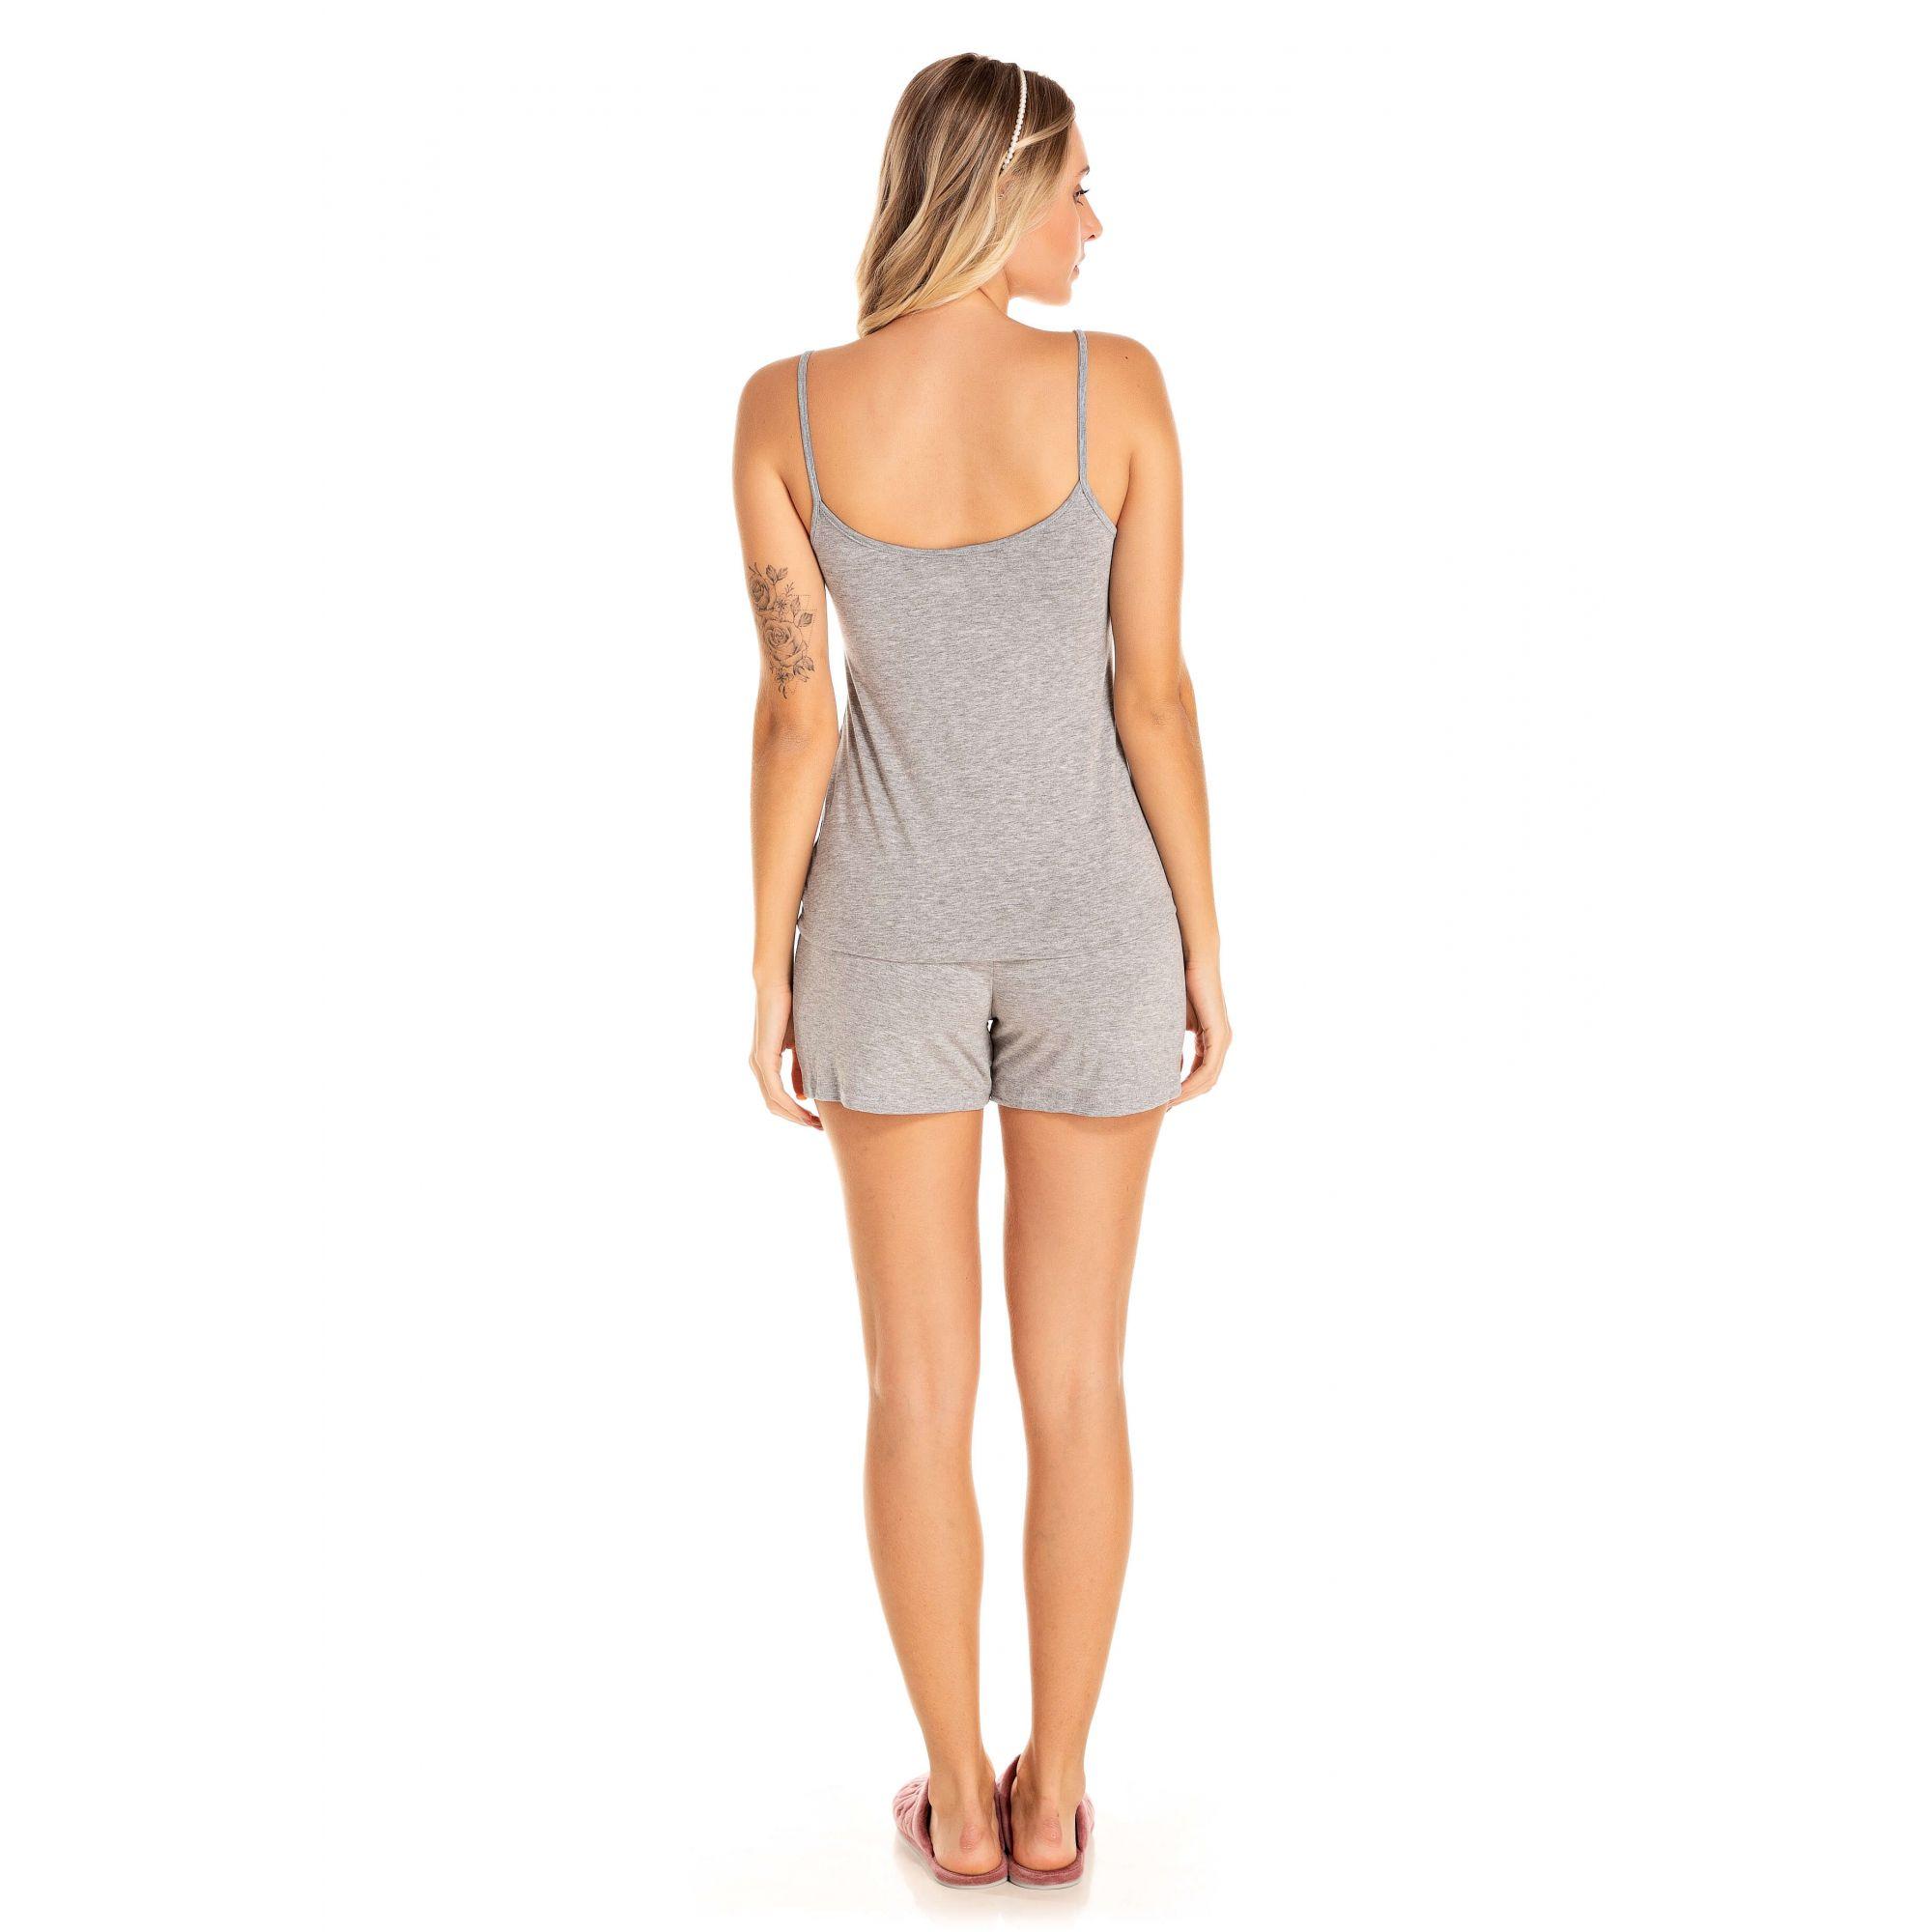 Shorts Feminino Viscolycra - Mescla